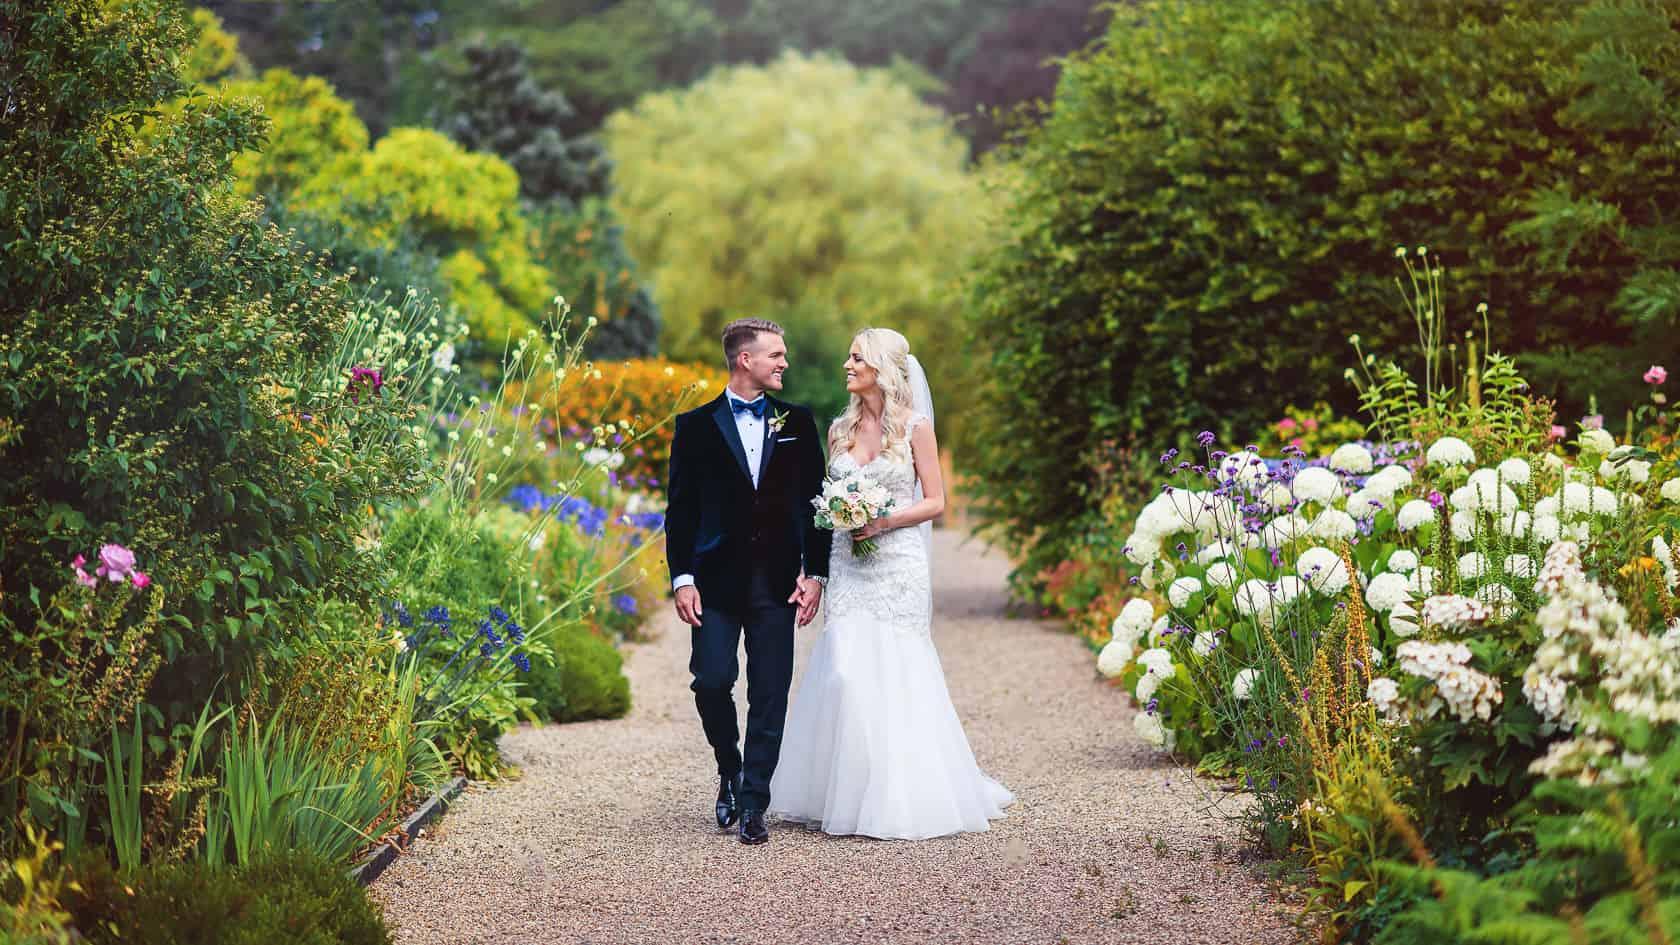 Best_Wedding_Photography_2018_Wedding-Photographer-Essex-and-London_041